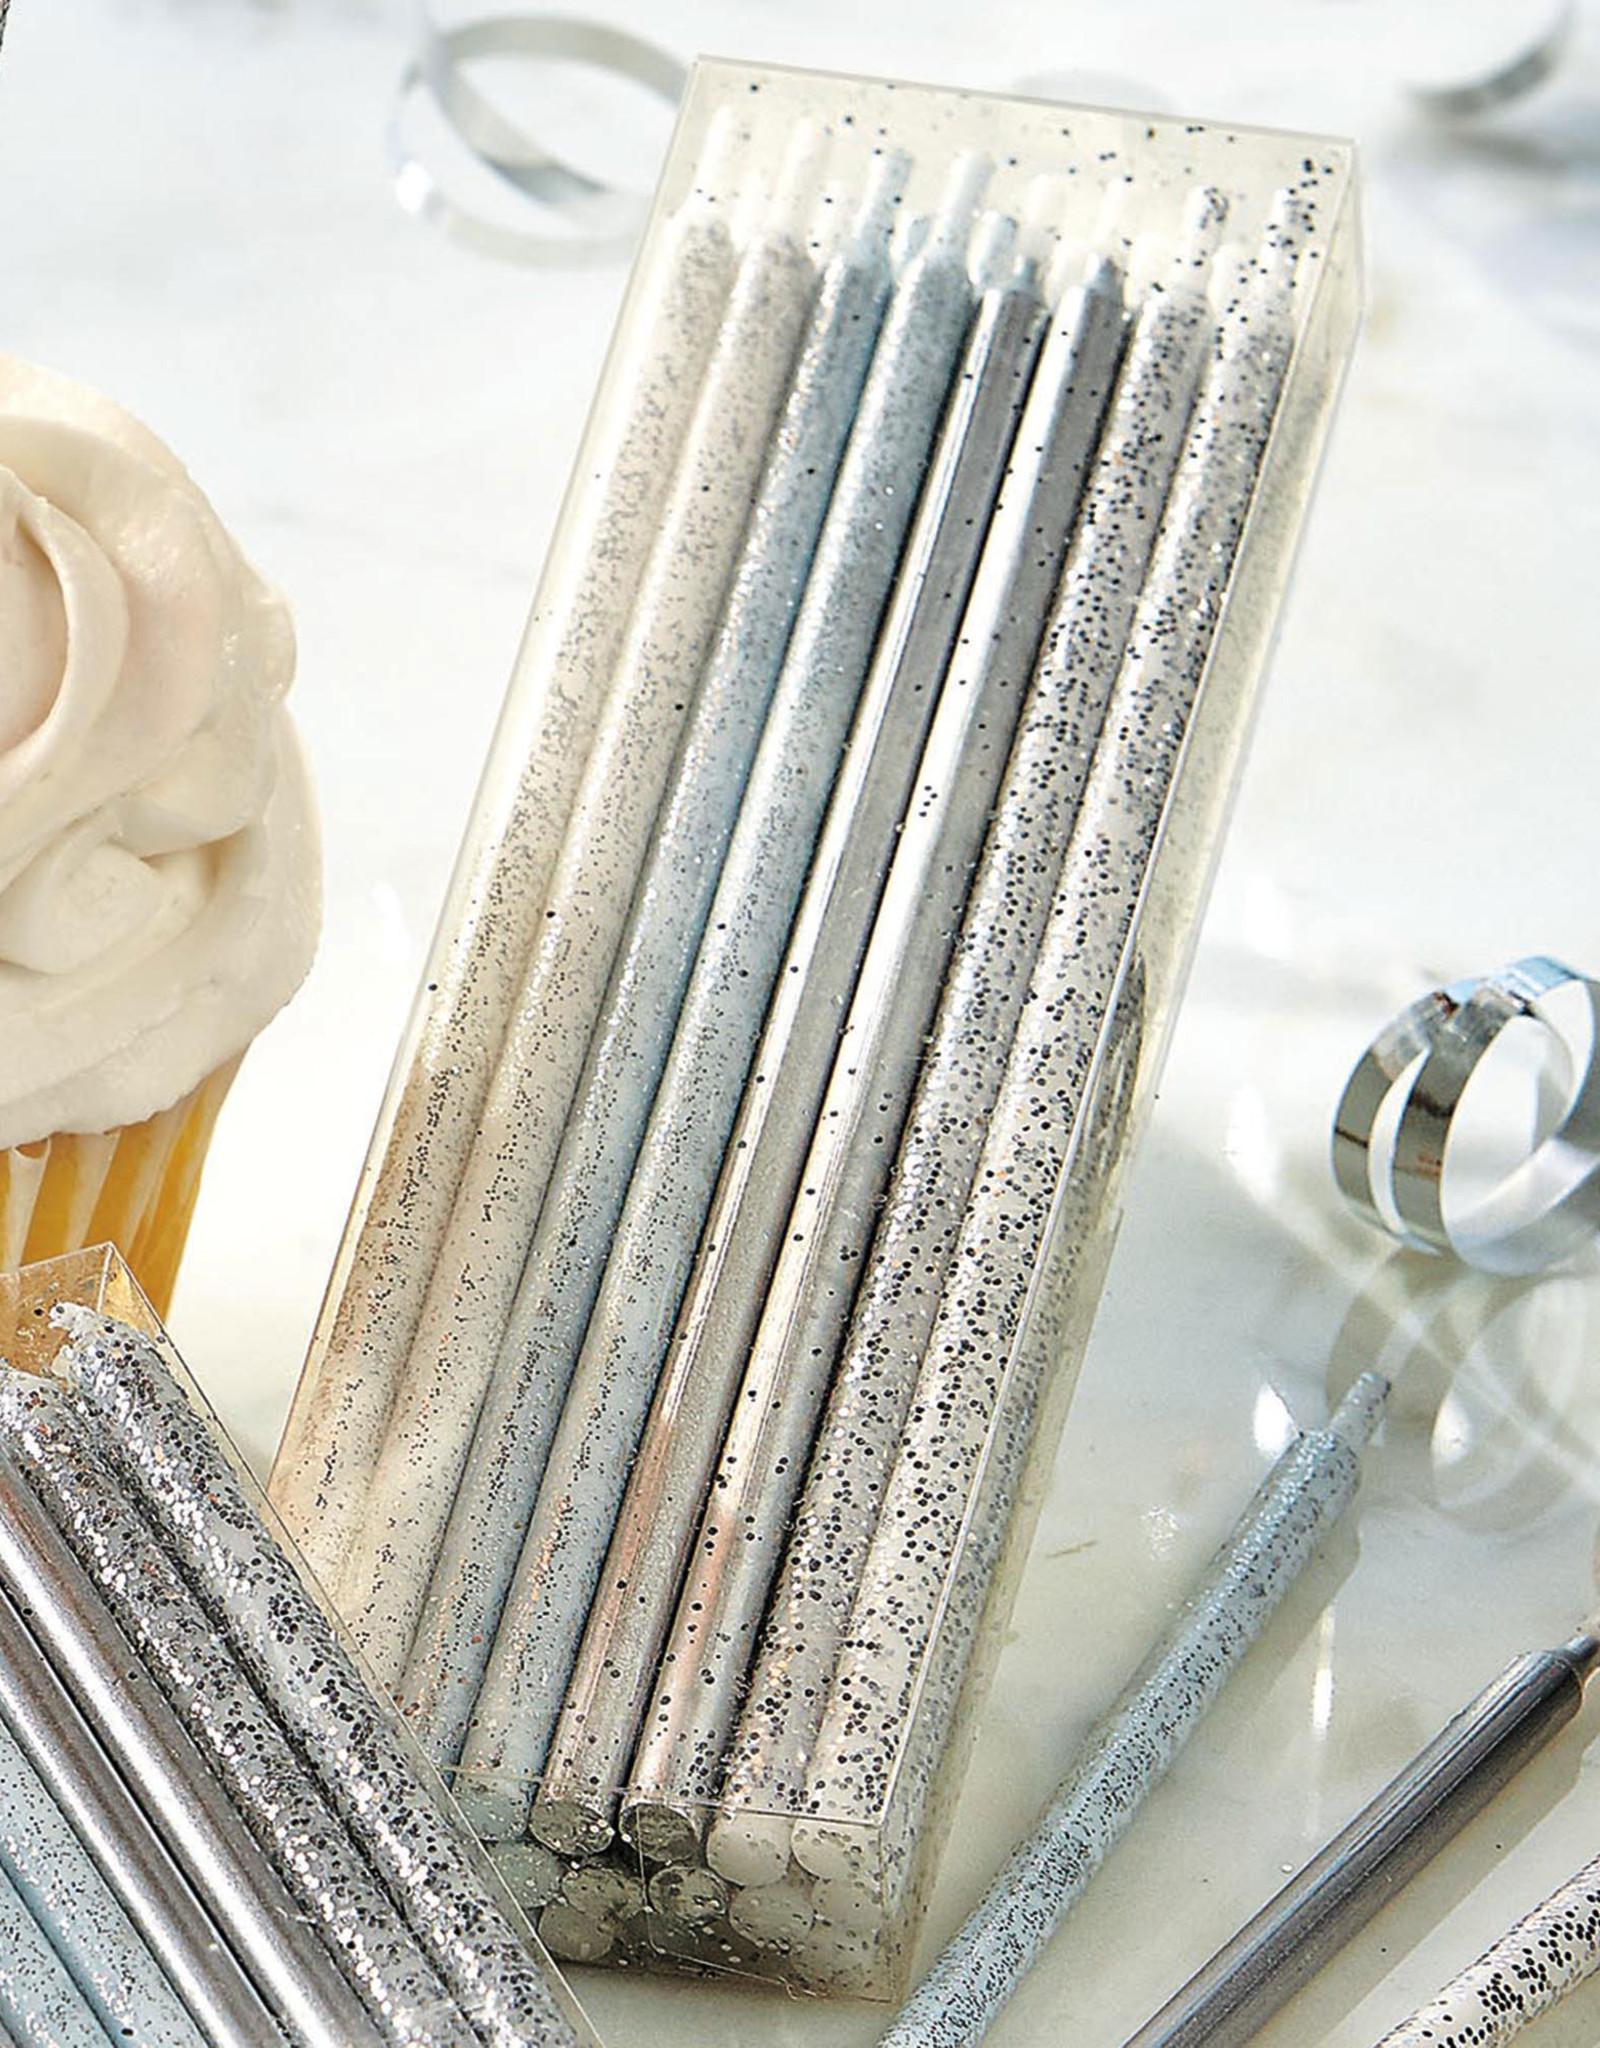 Tag Sparkle n shine tall candles: Metalic